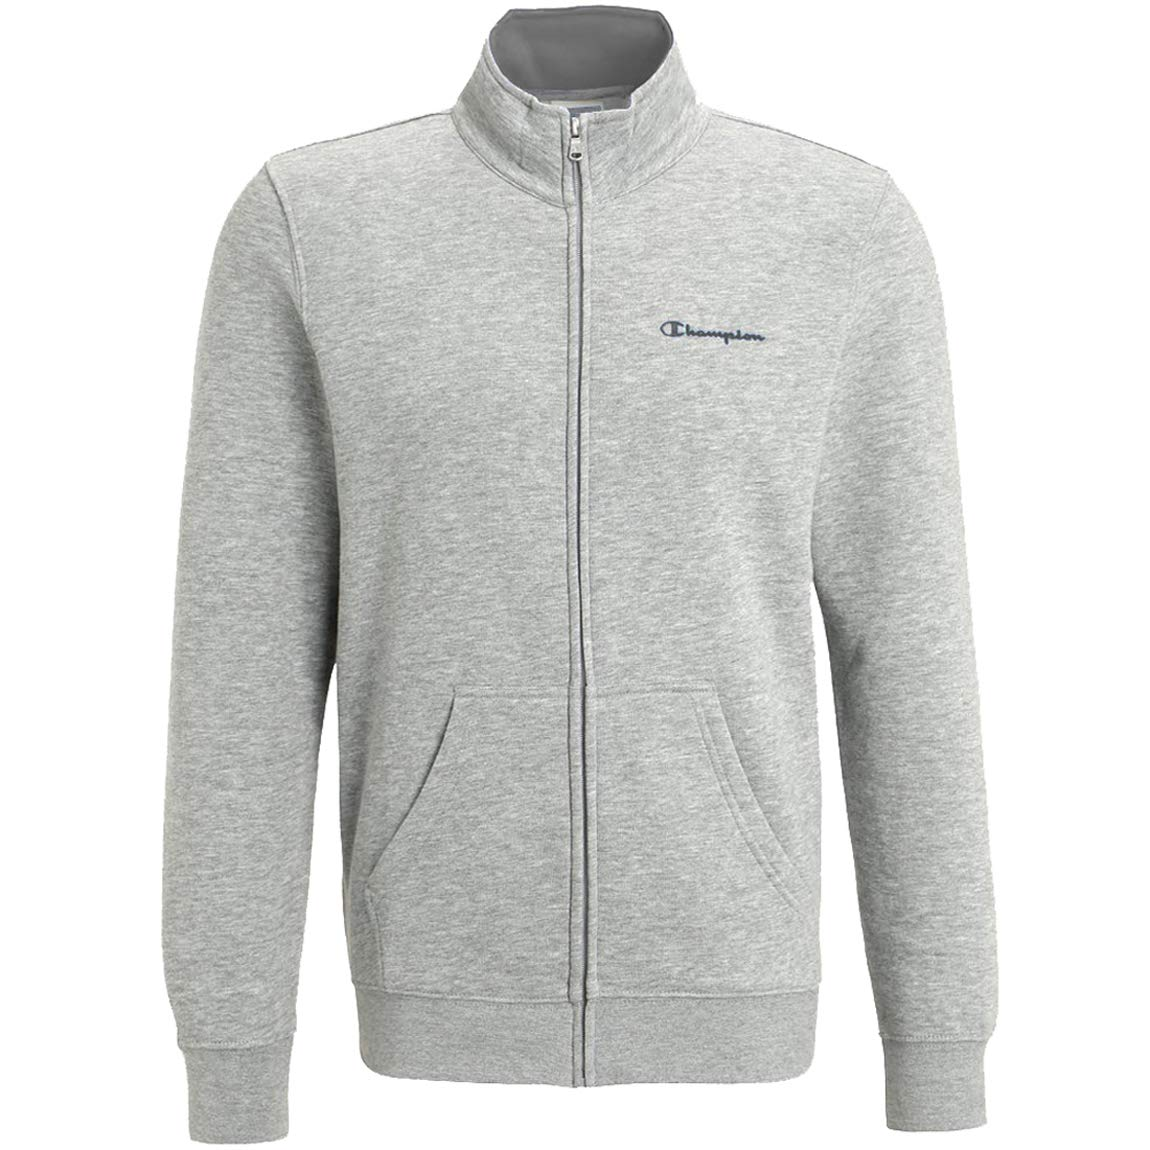 fed8a13d3bd7 Amazon.com  Champion Full Zip Long Sleeve Sweatshirt - Grey  Sports    Outdoors